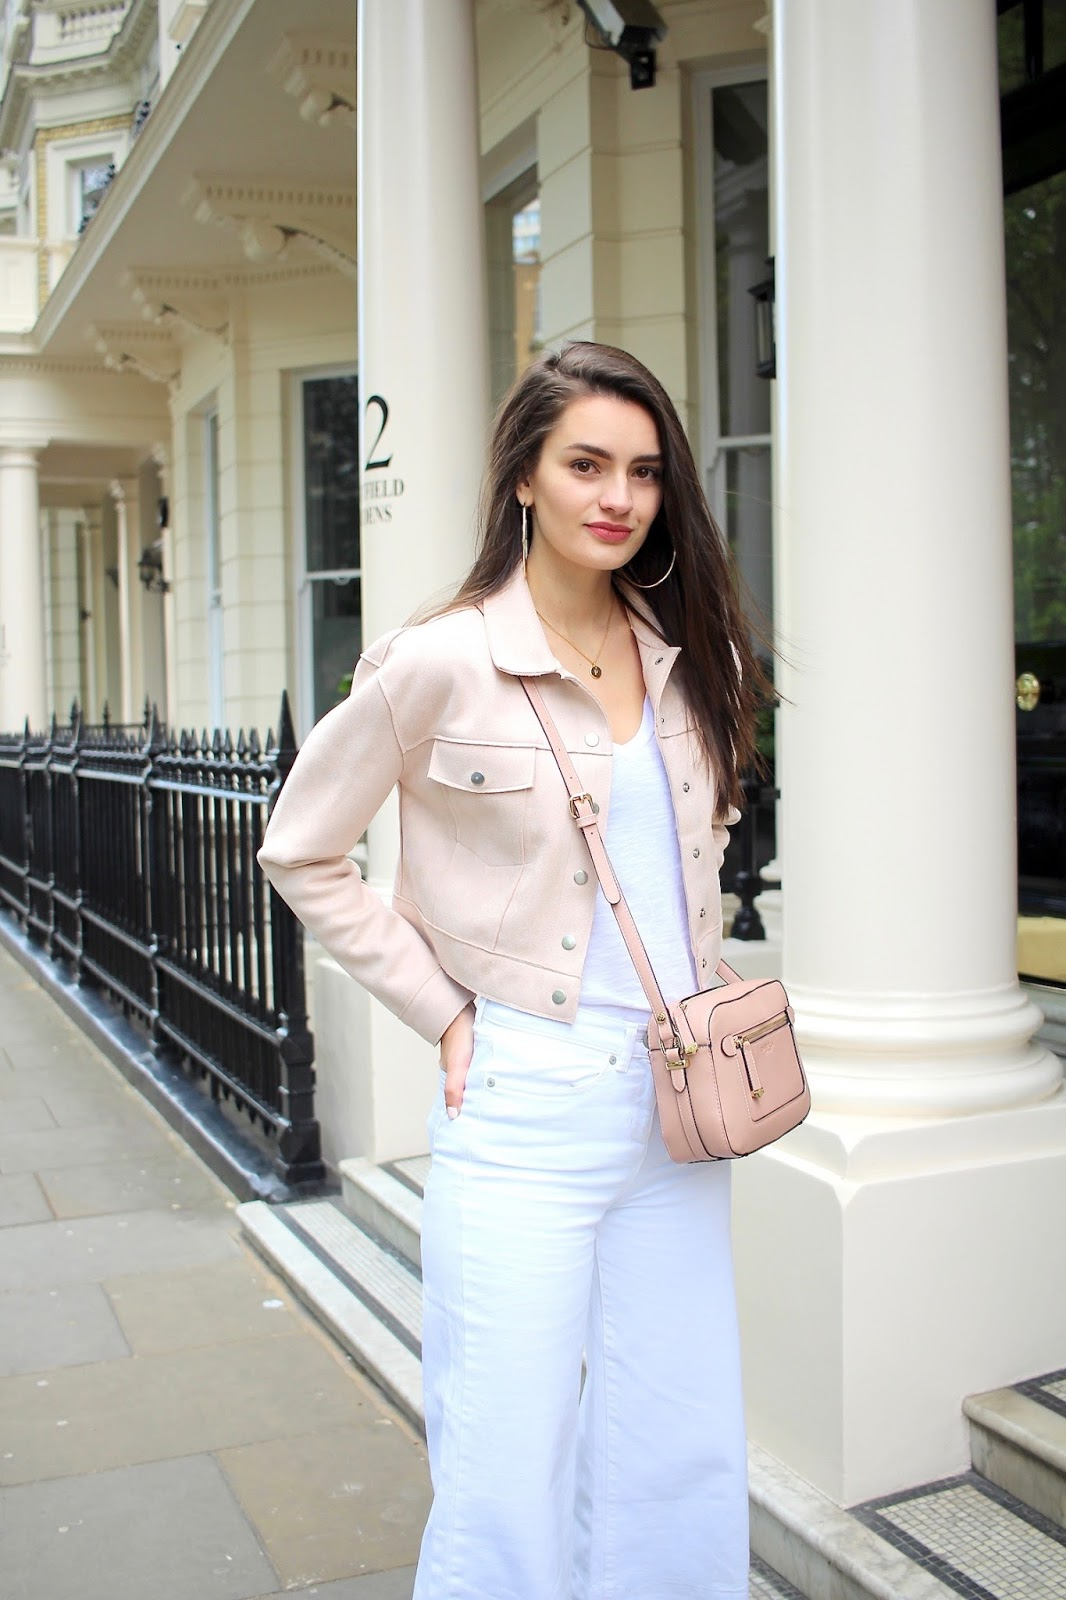 peexo street style blogger light spring wardrobe